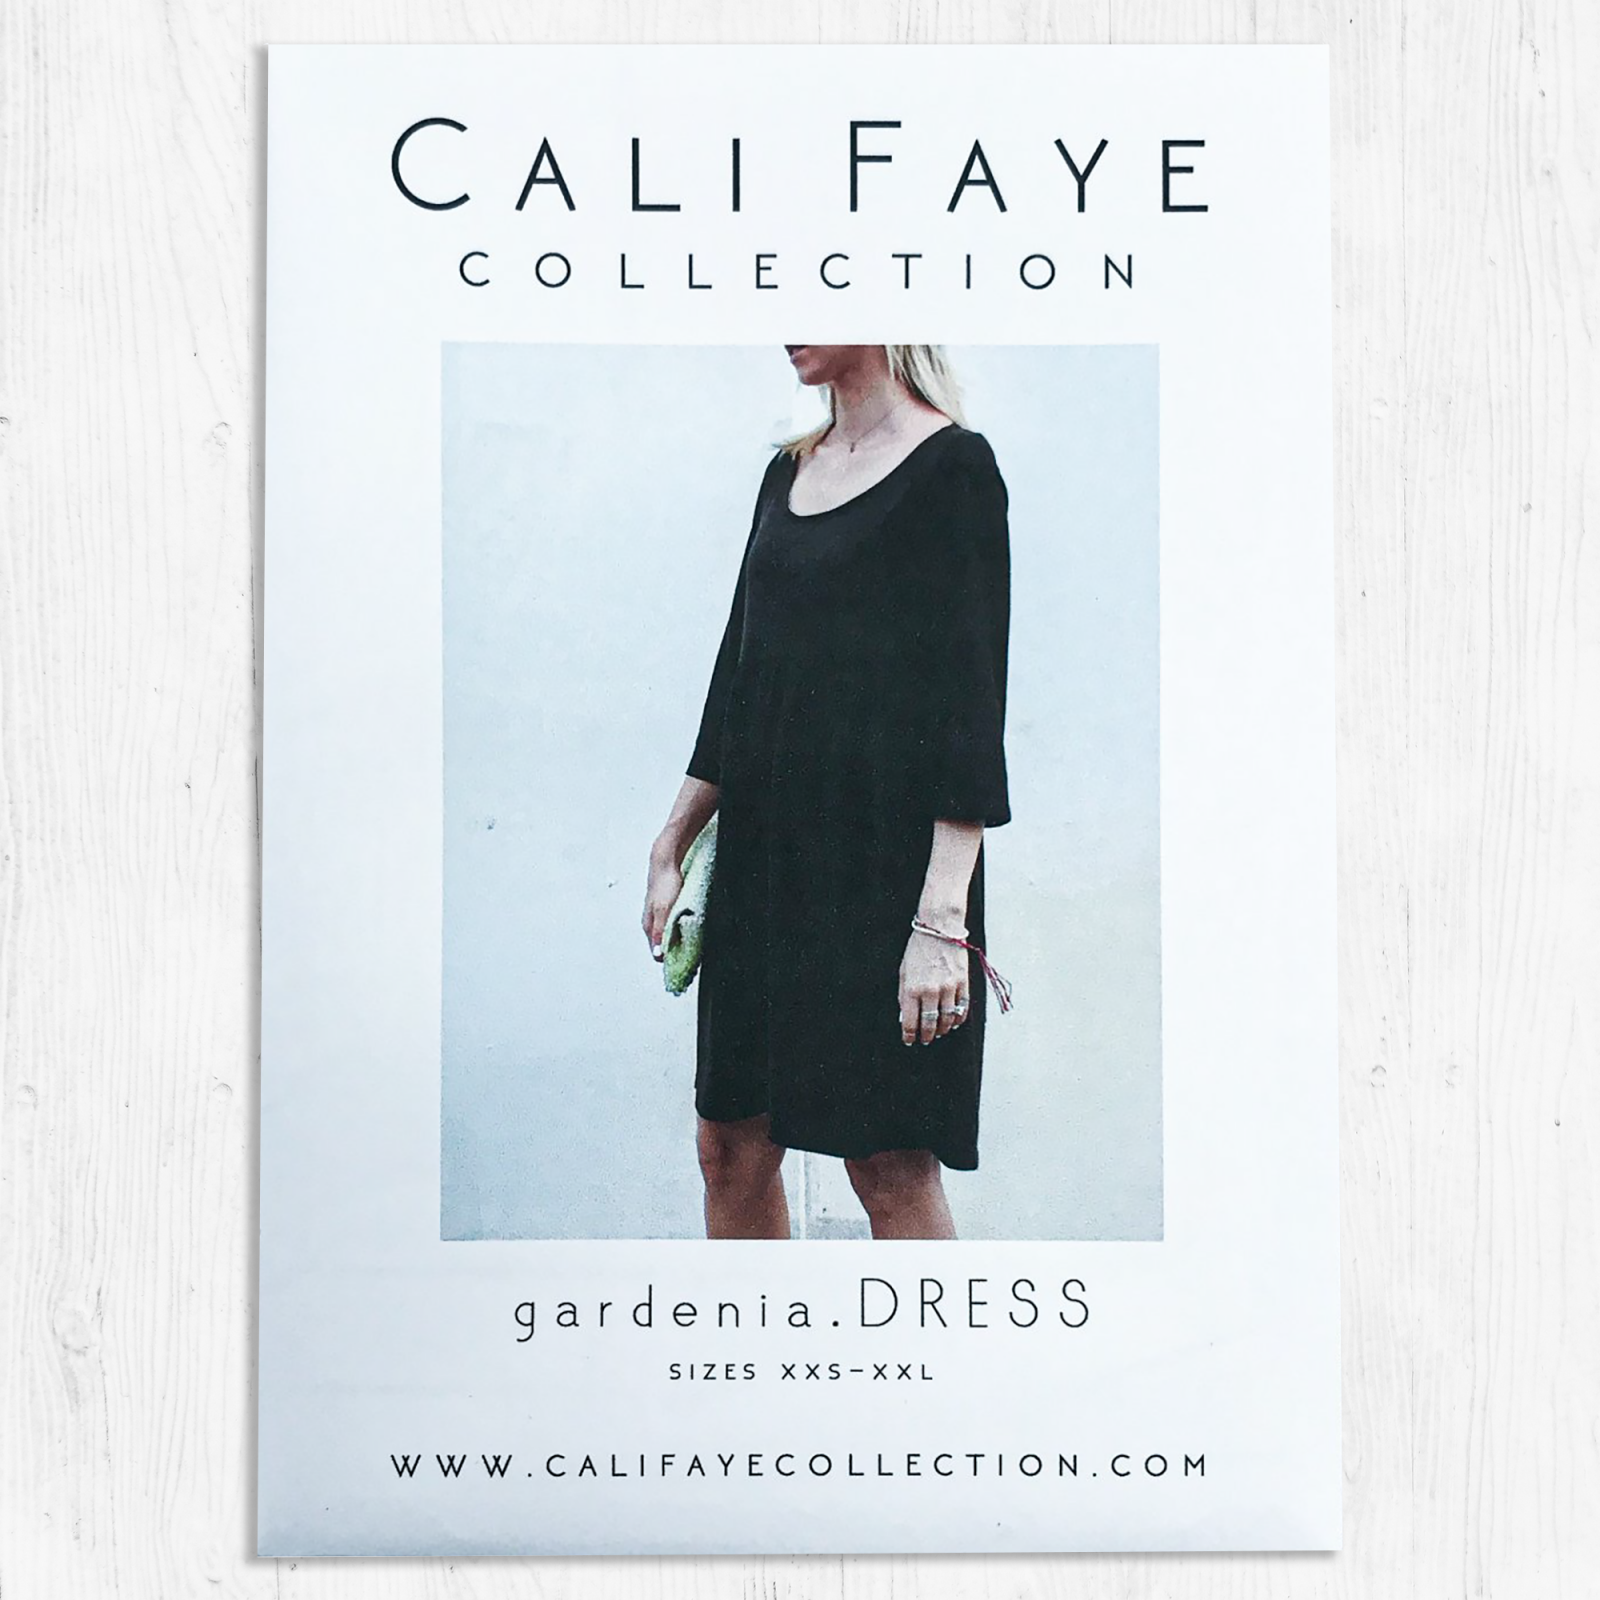 Cali Faye Collection - Gardenia Dress